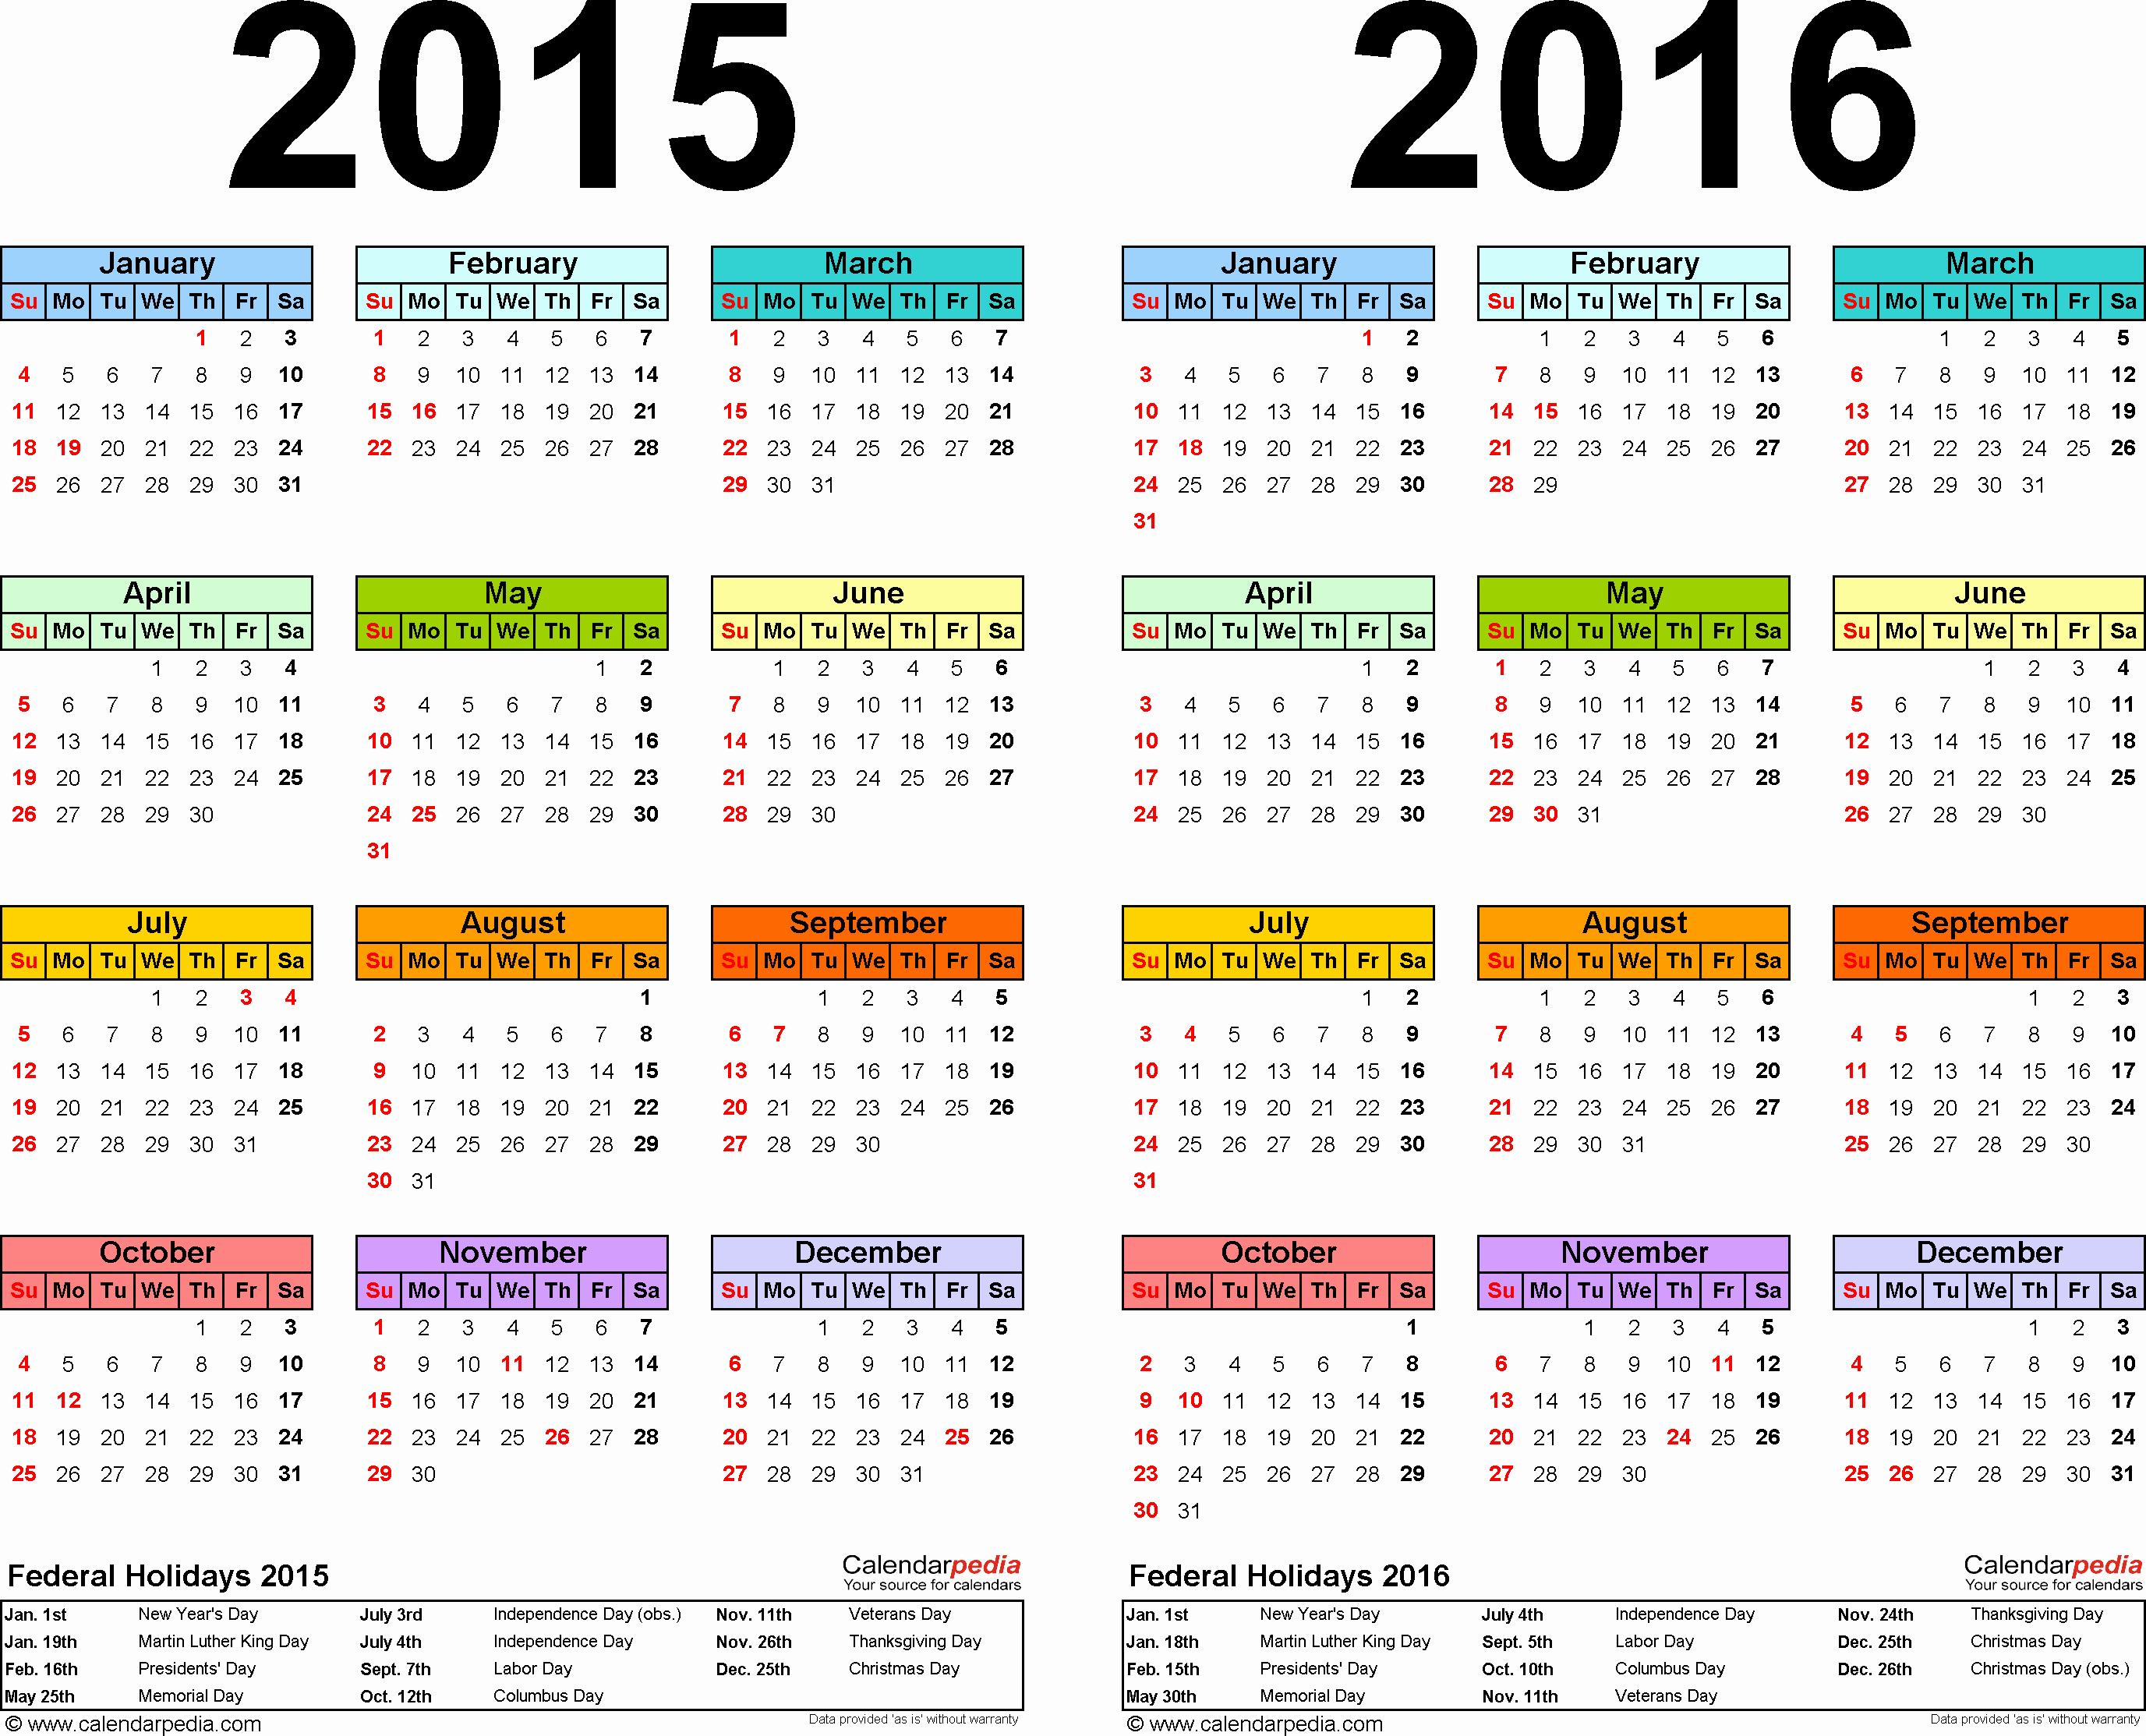 2015 Yearly Calendar Printable Landscape New 2015 2016 Calendar Free Printable Two Year Pdf Calendars